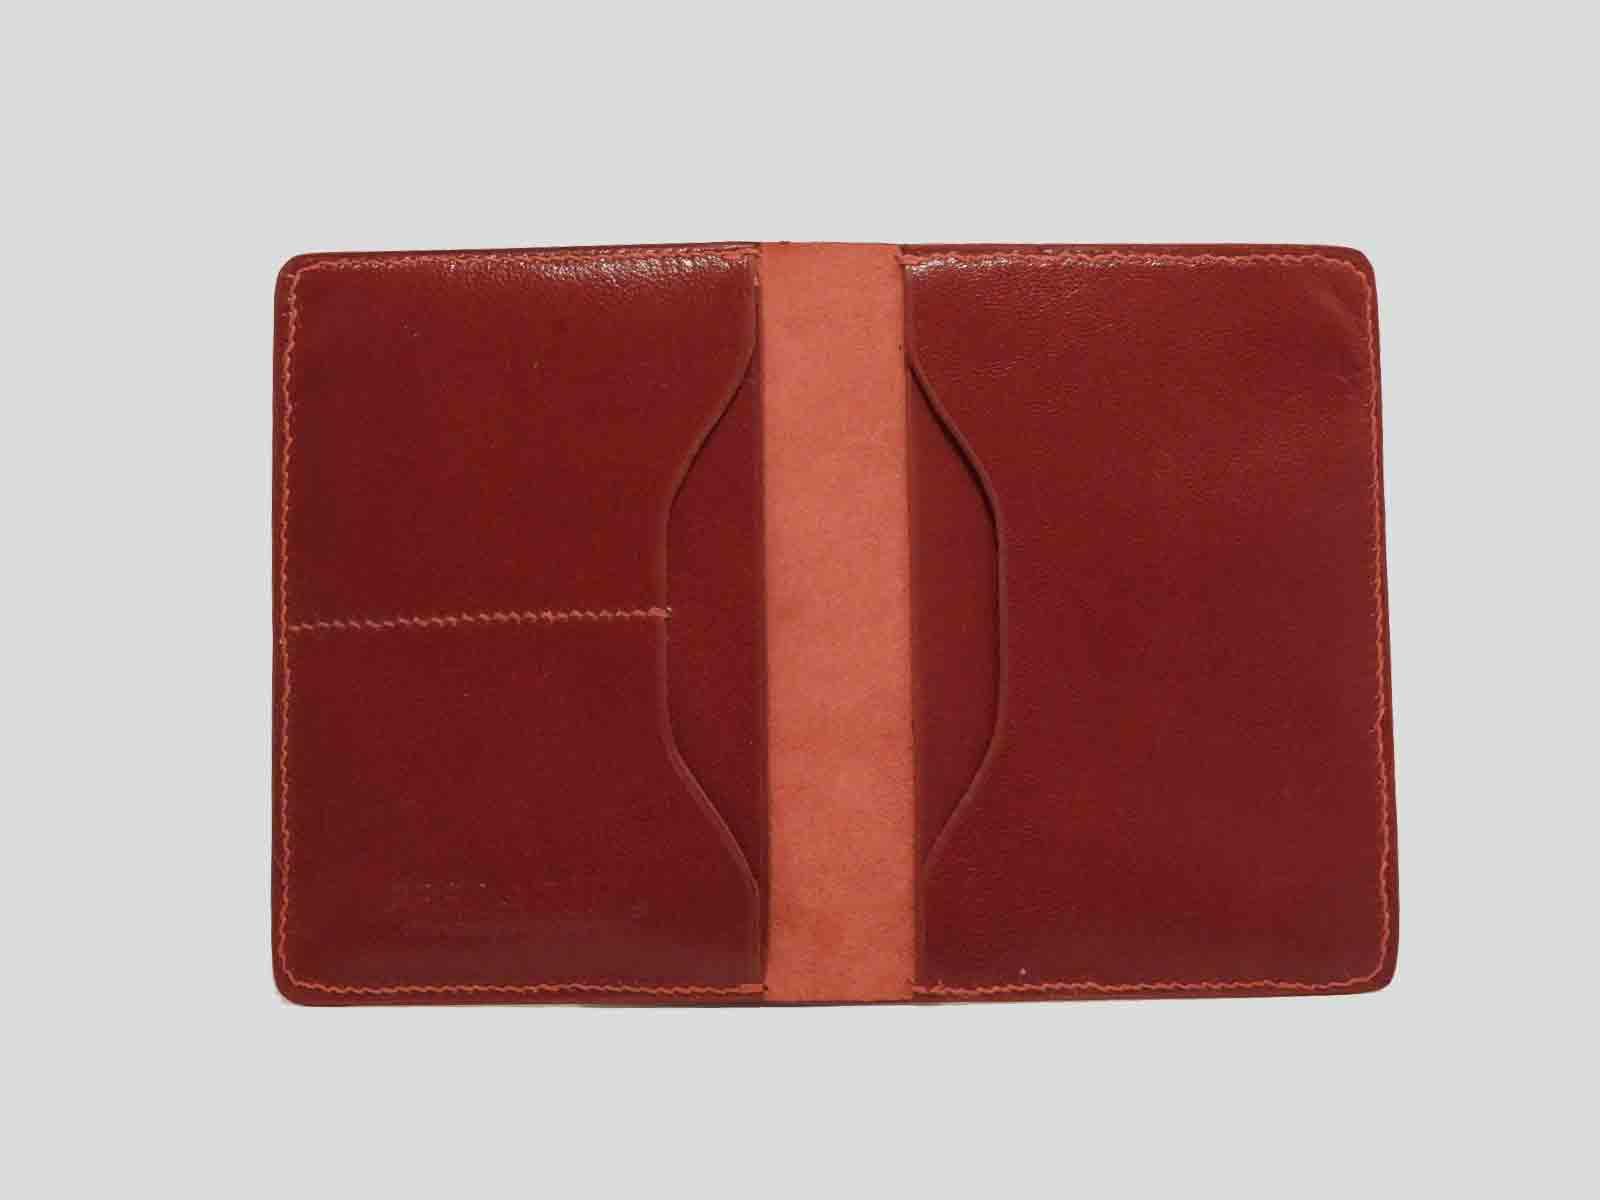 BALI, protège passeport en cuir de veau rouge framboise